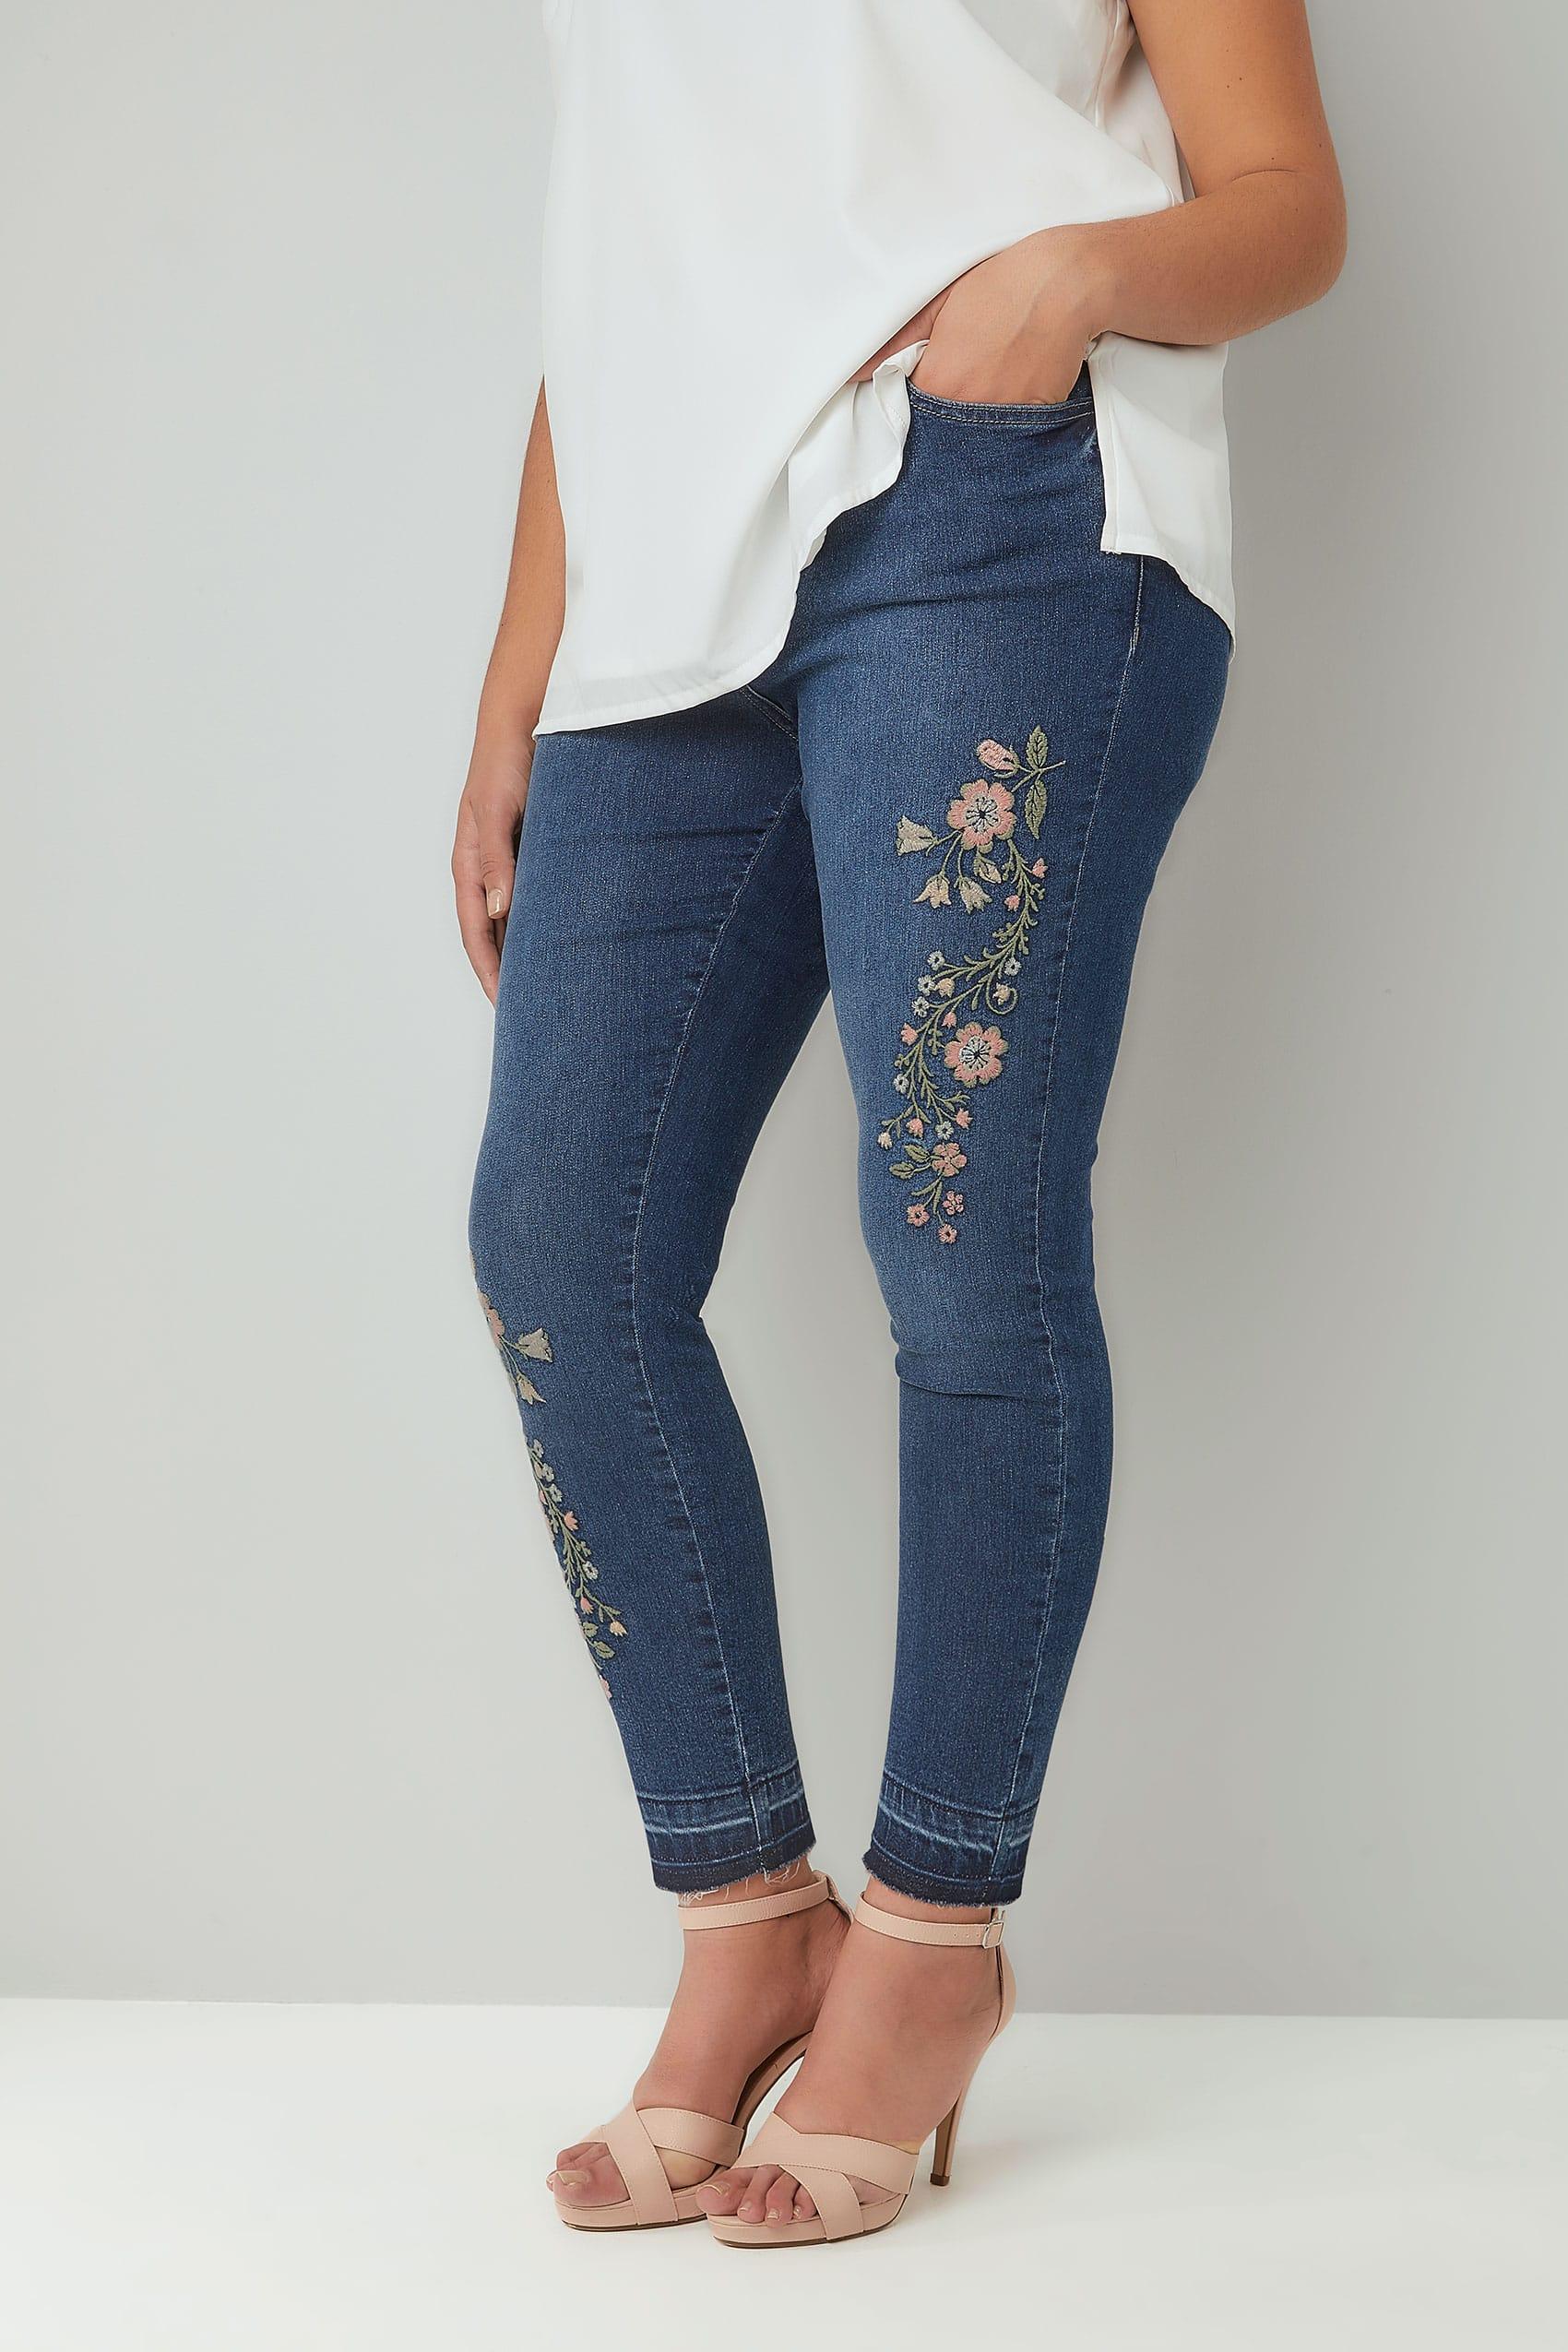 Blue Washed Denim Embroidered Skinny AVA Jeans